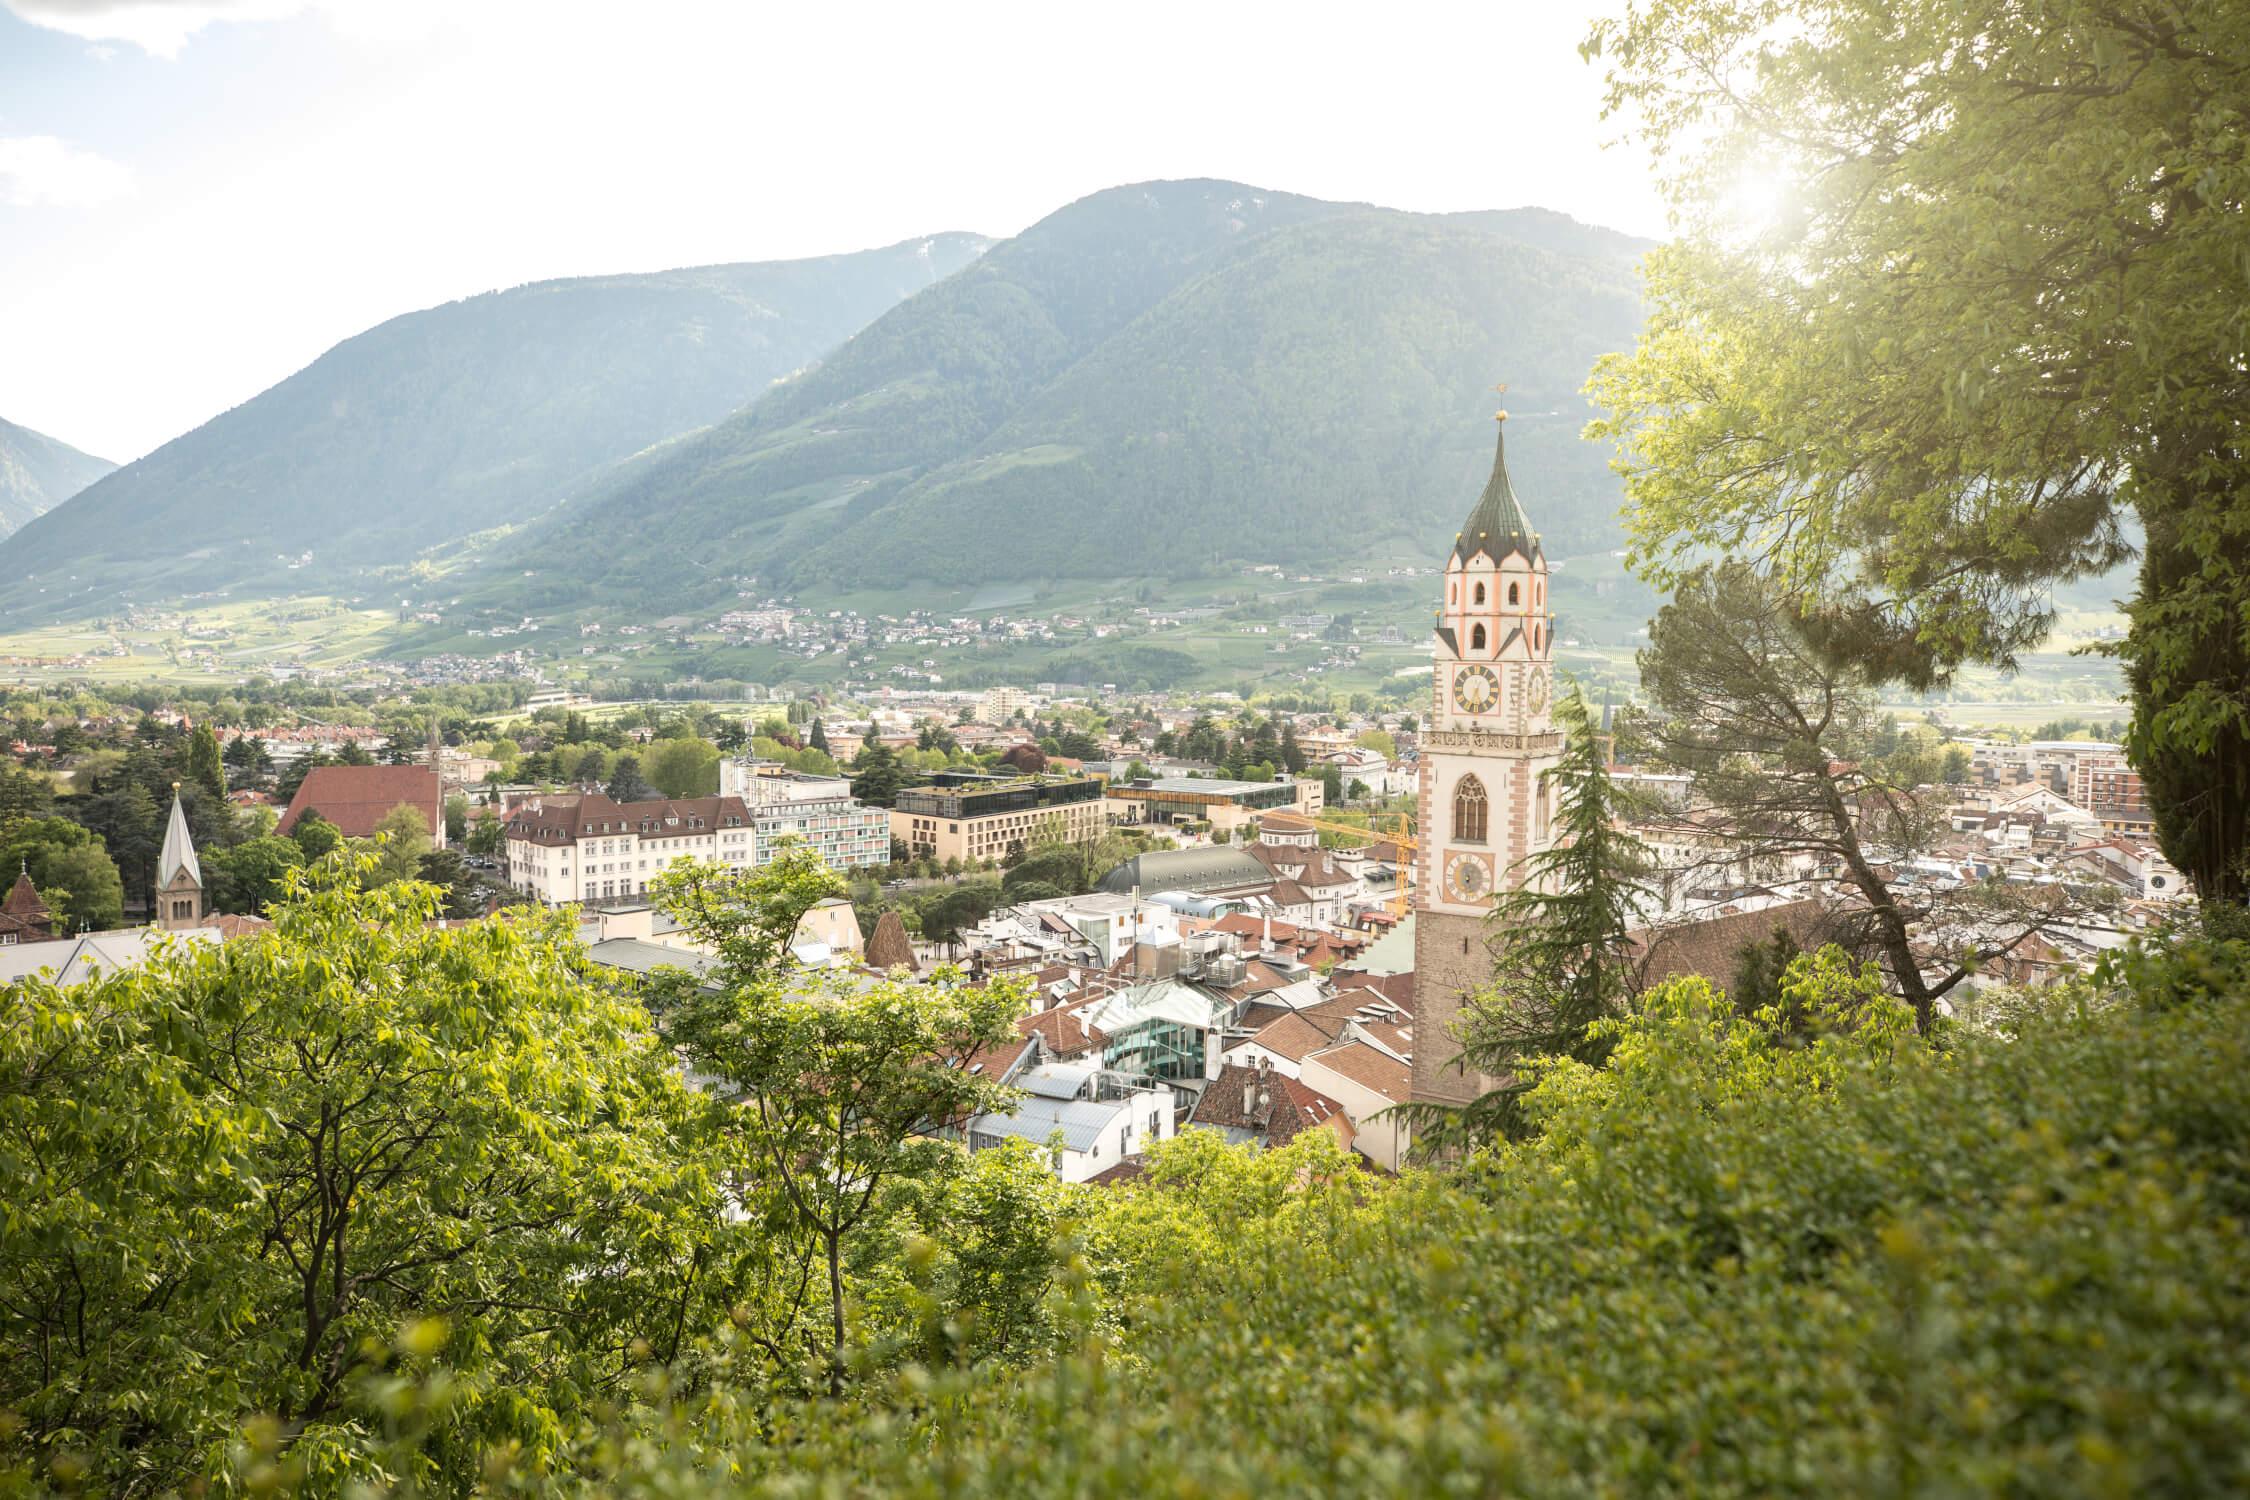 Italien-Trentino_Suedtirol_Alto_Adige_Merano_Meran_Natur_Panorama_Tappeinerweg_IDM_MarionLafogler_idm06975mala_2250x1500